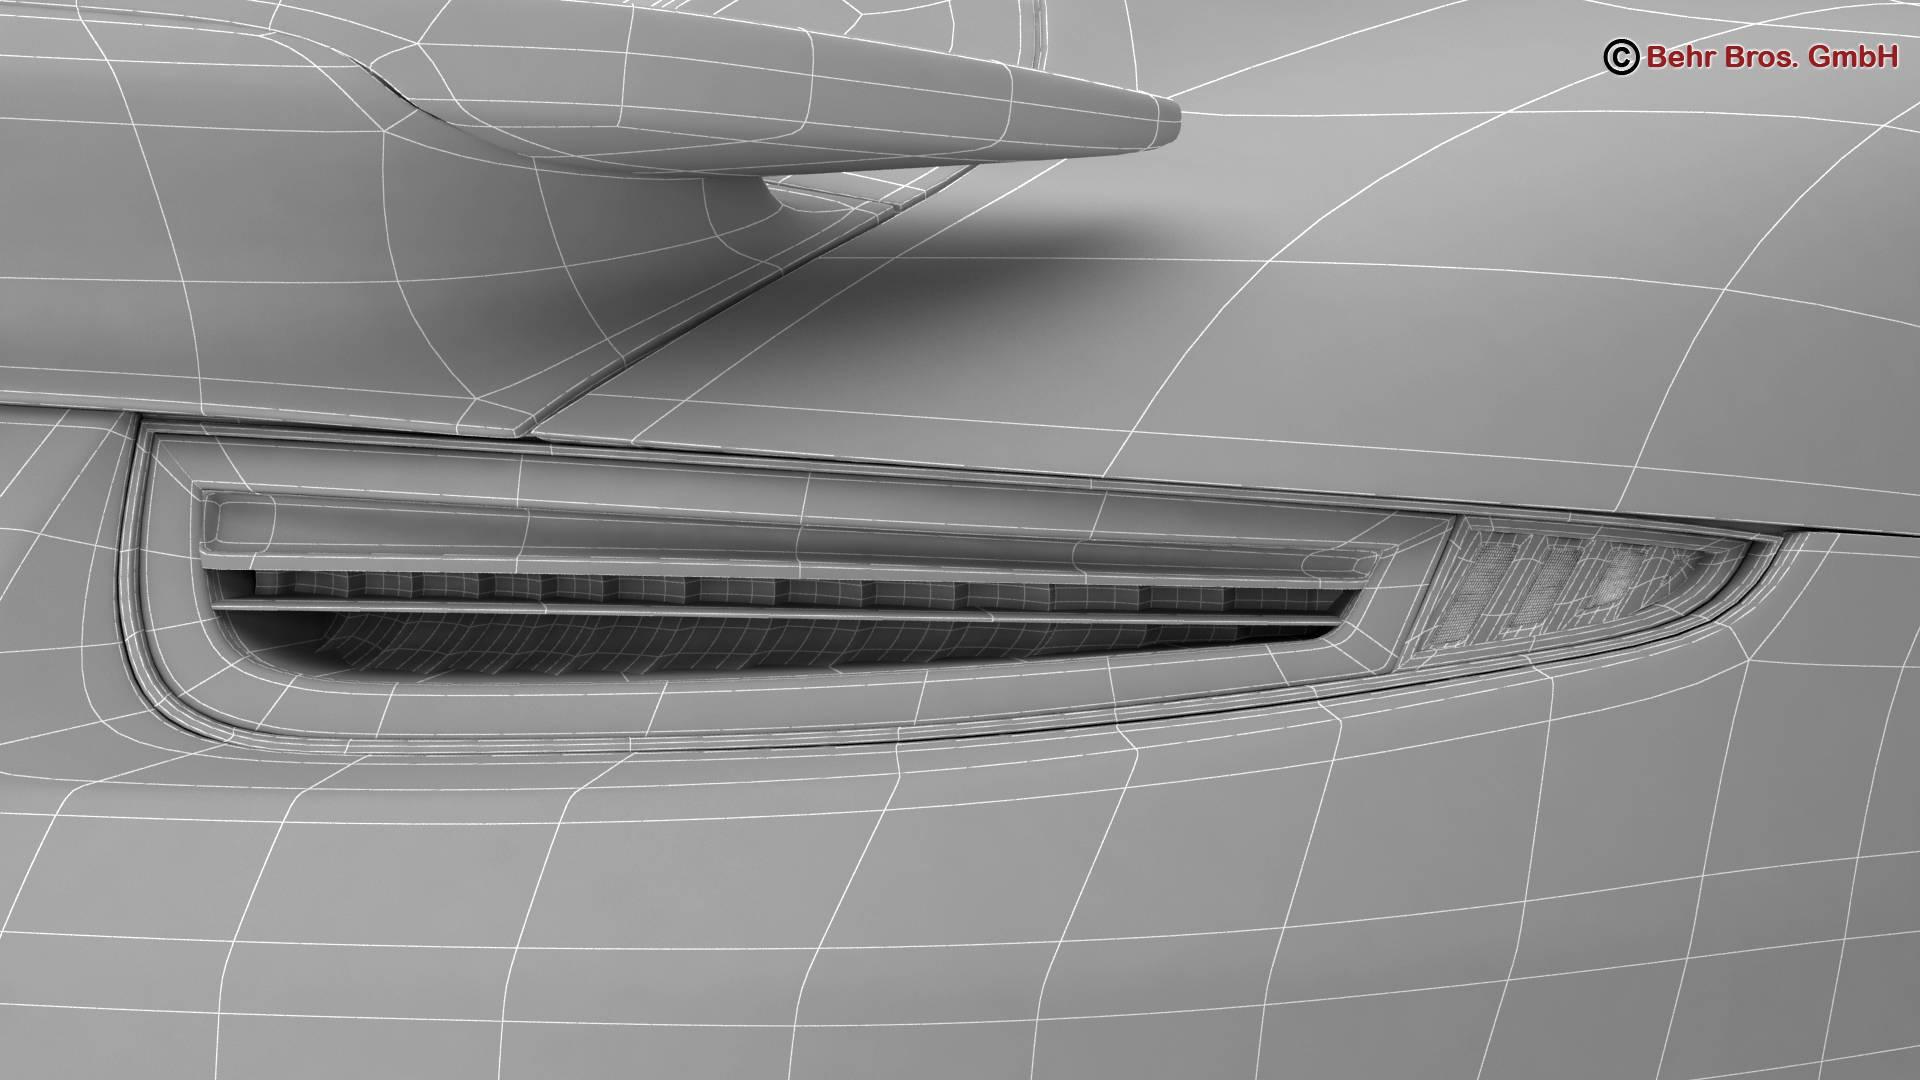 porsche 911 turbo s 2014 3d model 3ds max fbx c4d lwo ma mb obj 212500